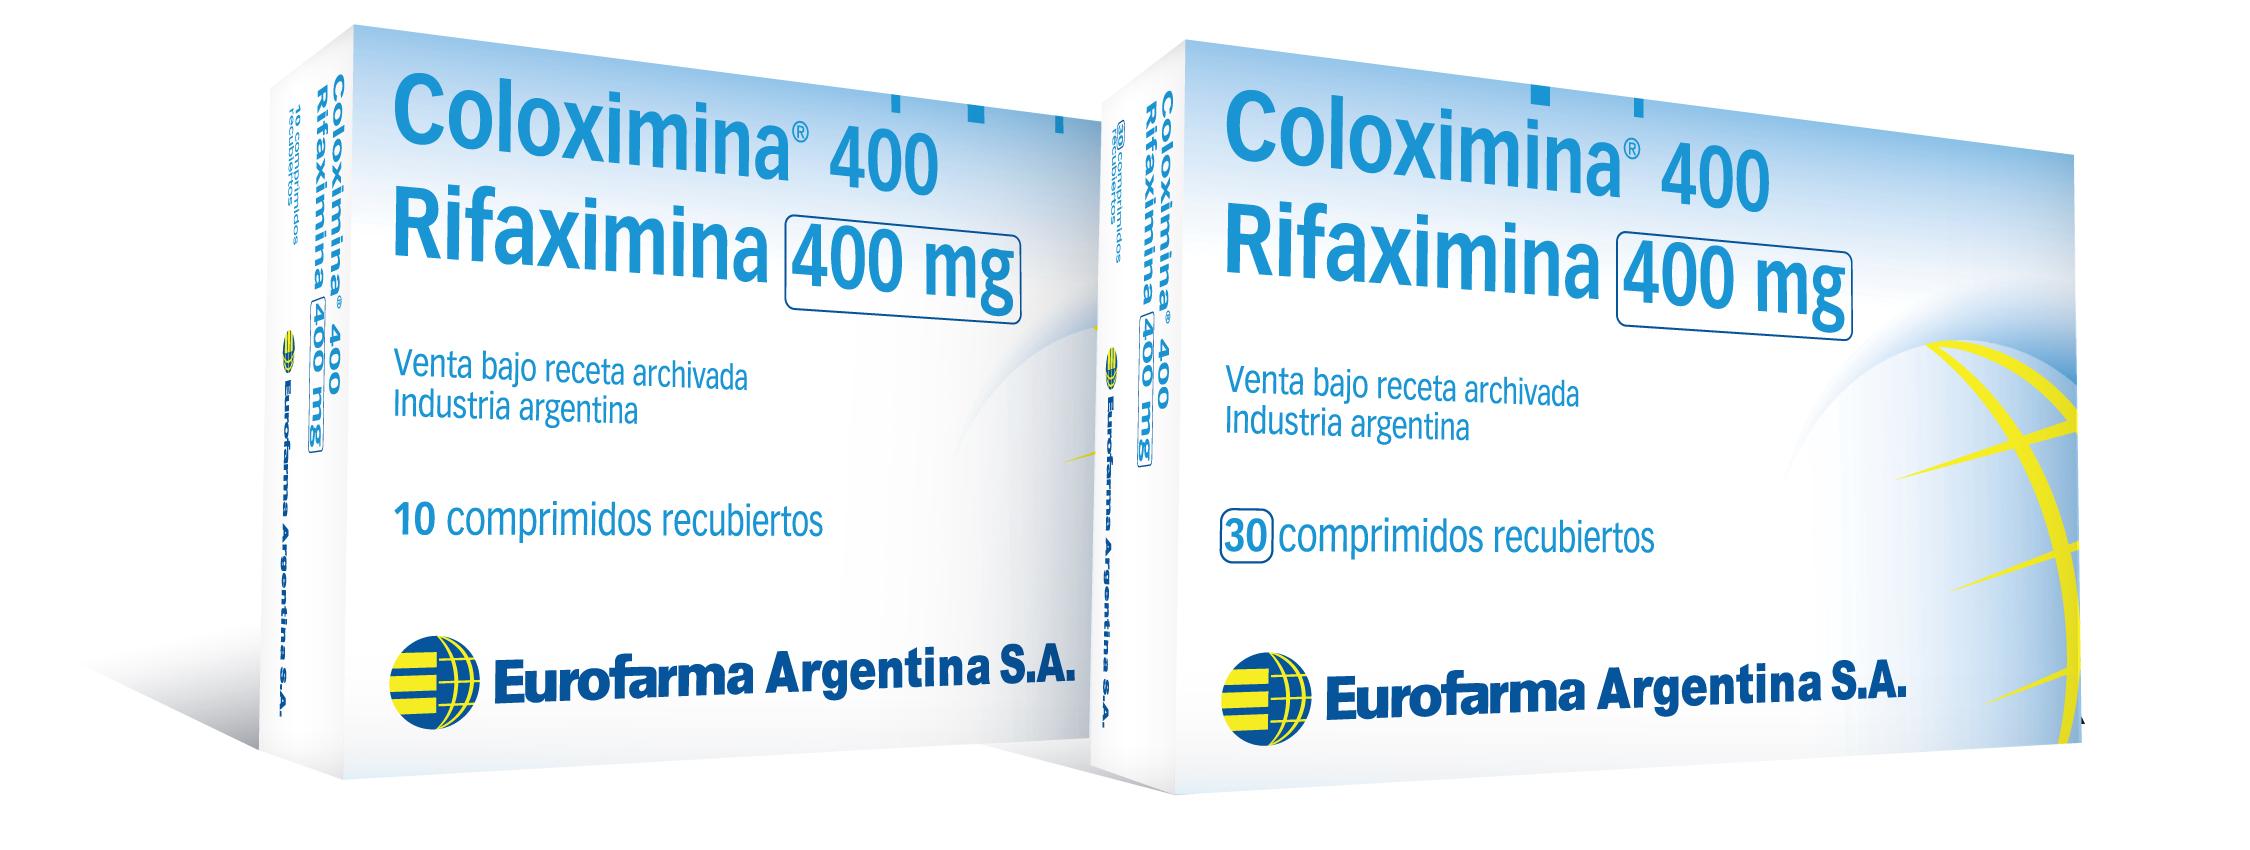 Coloximina